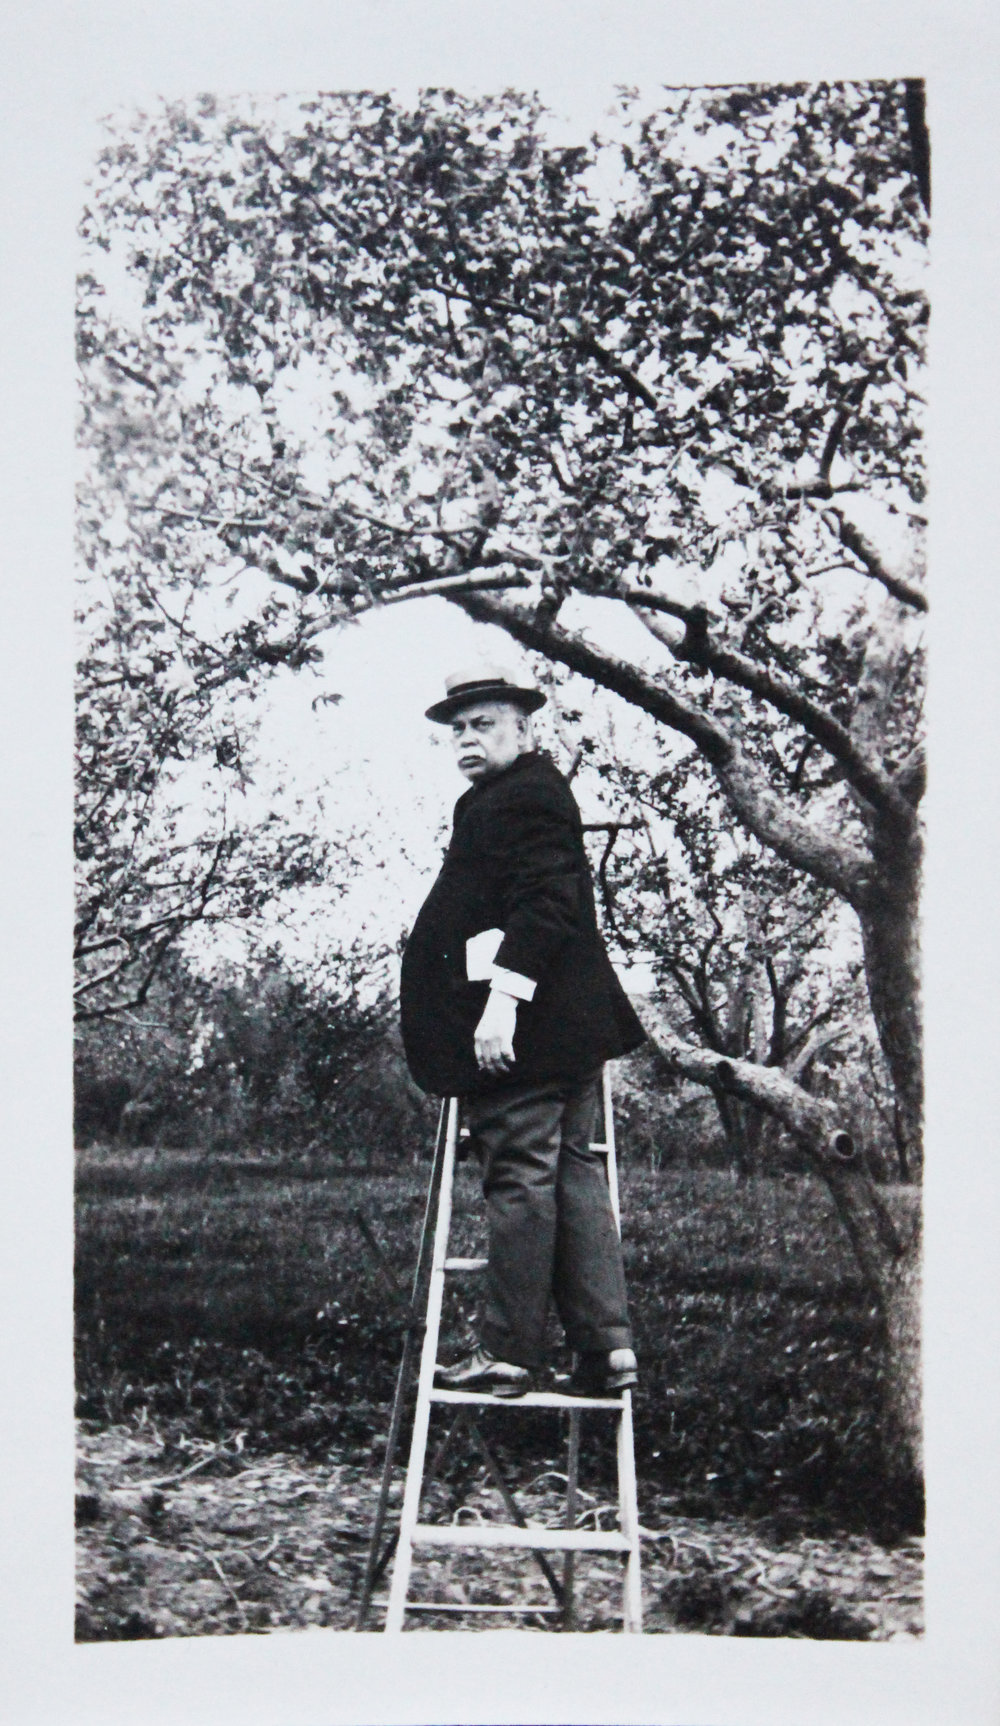 James orchard 2.75 x 4.5.JPG